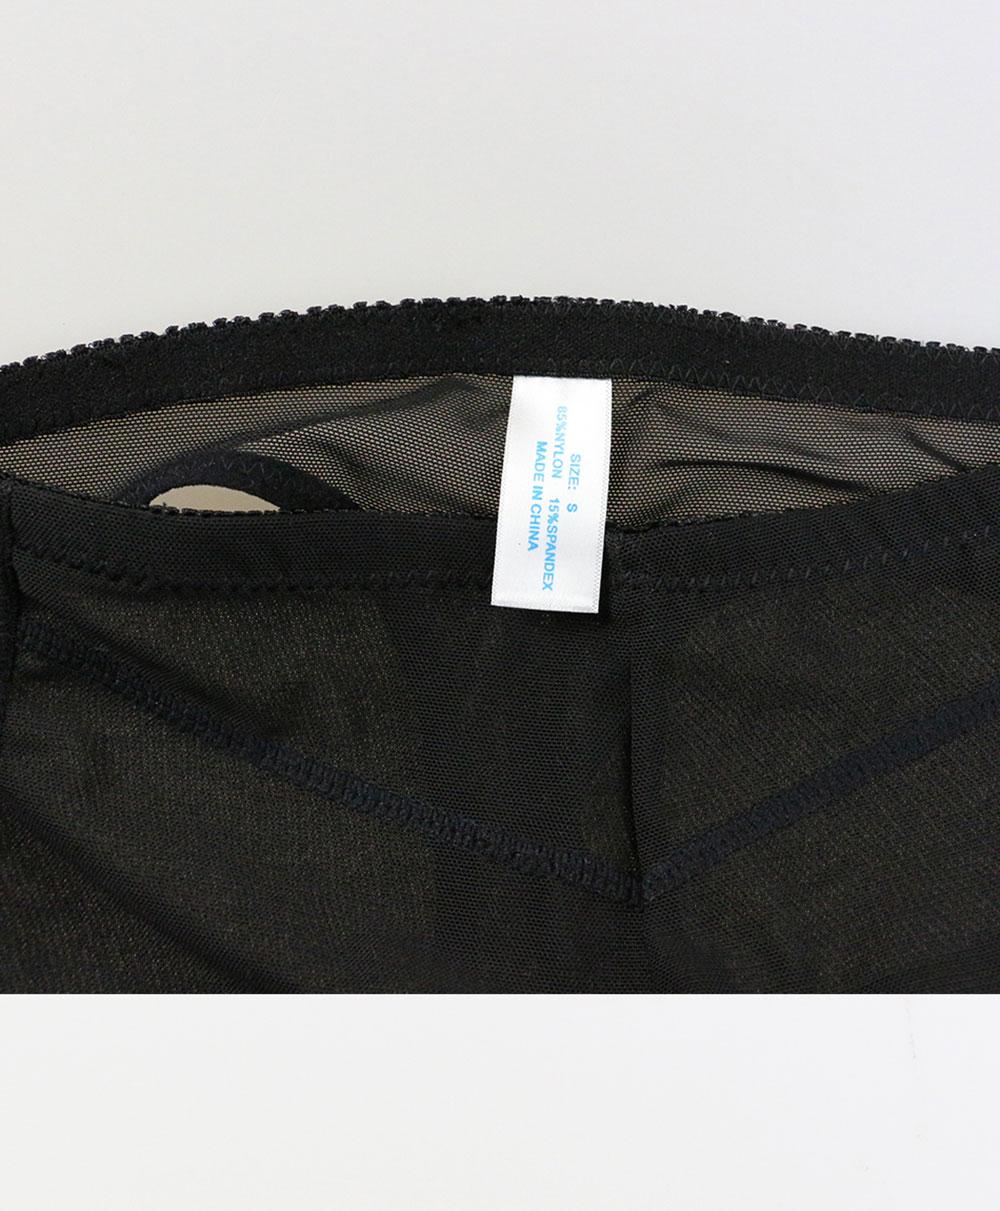 NB4001-2 Atbuty Sexy Butt Lifter Shaper Push Up Hips Enhancer Breathable Mesh Control Panty Butt Lift  Body Shaperwears (14)